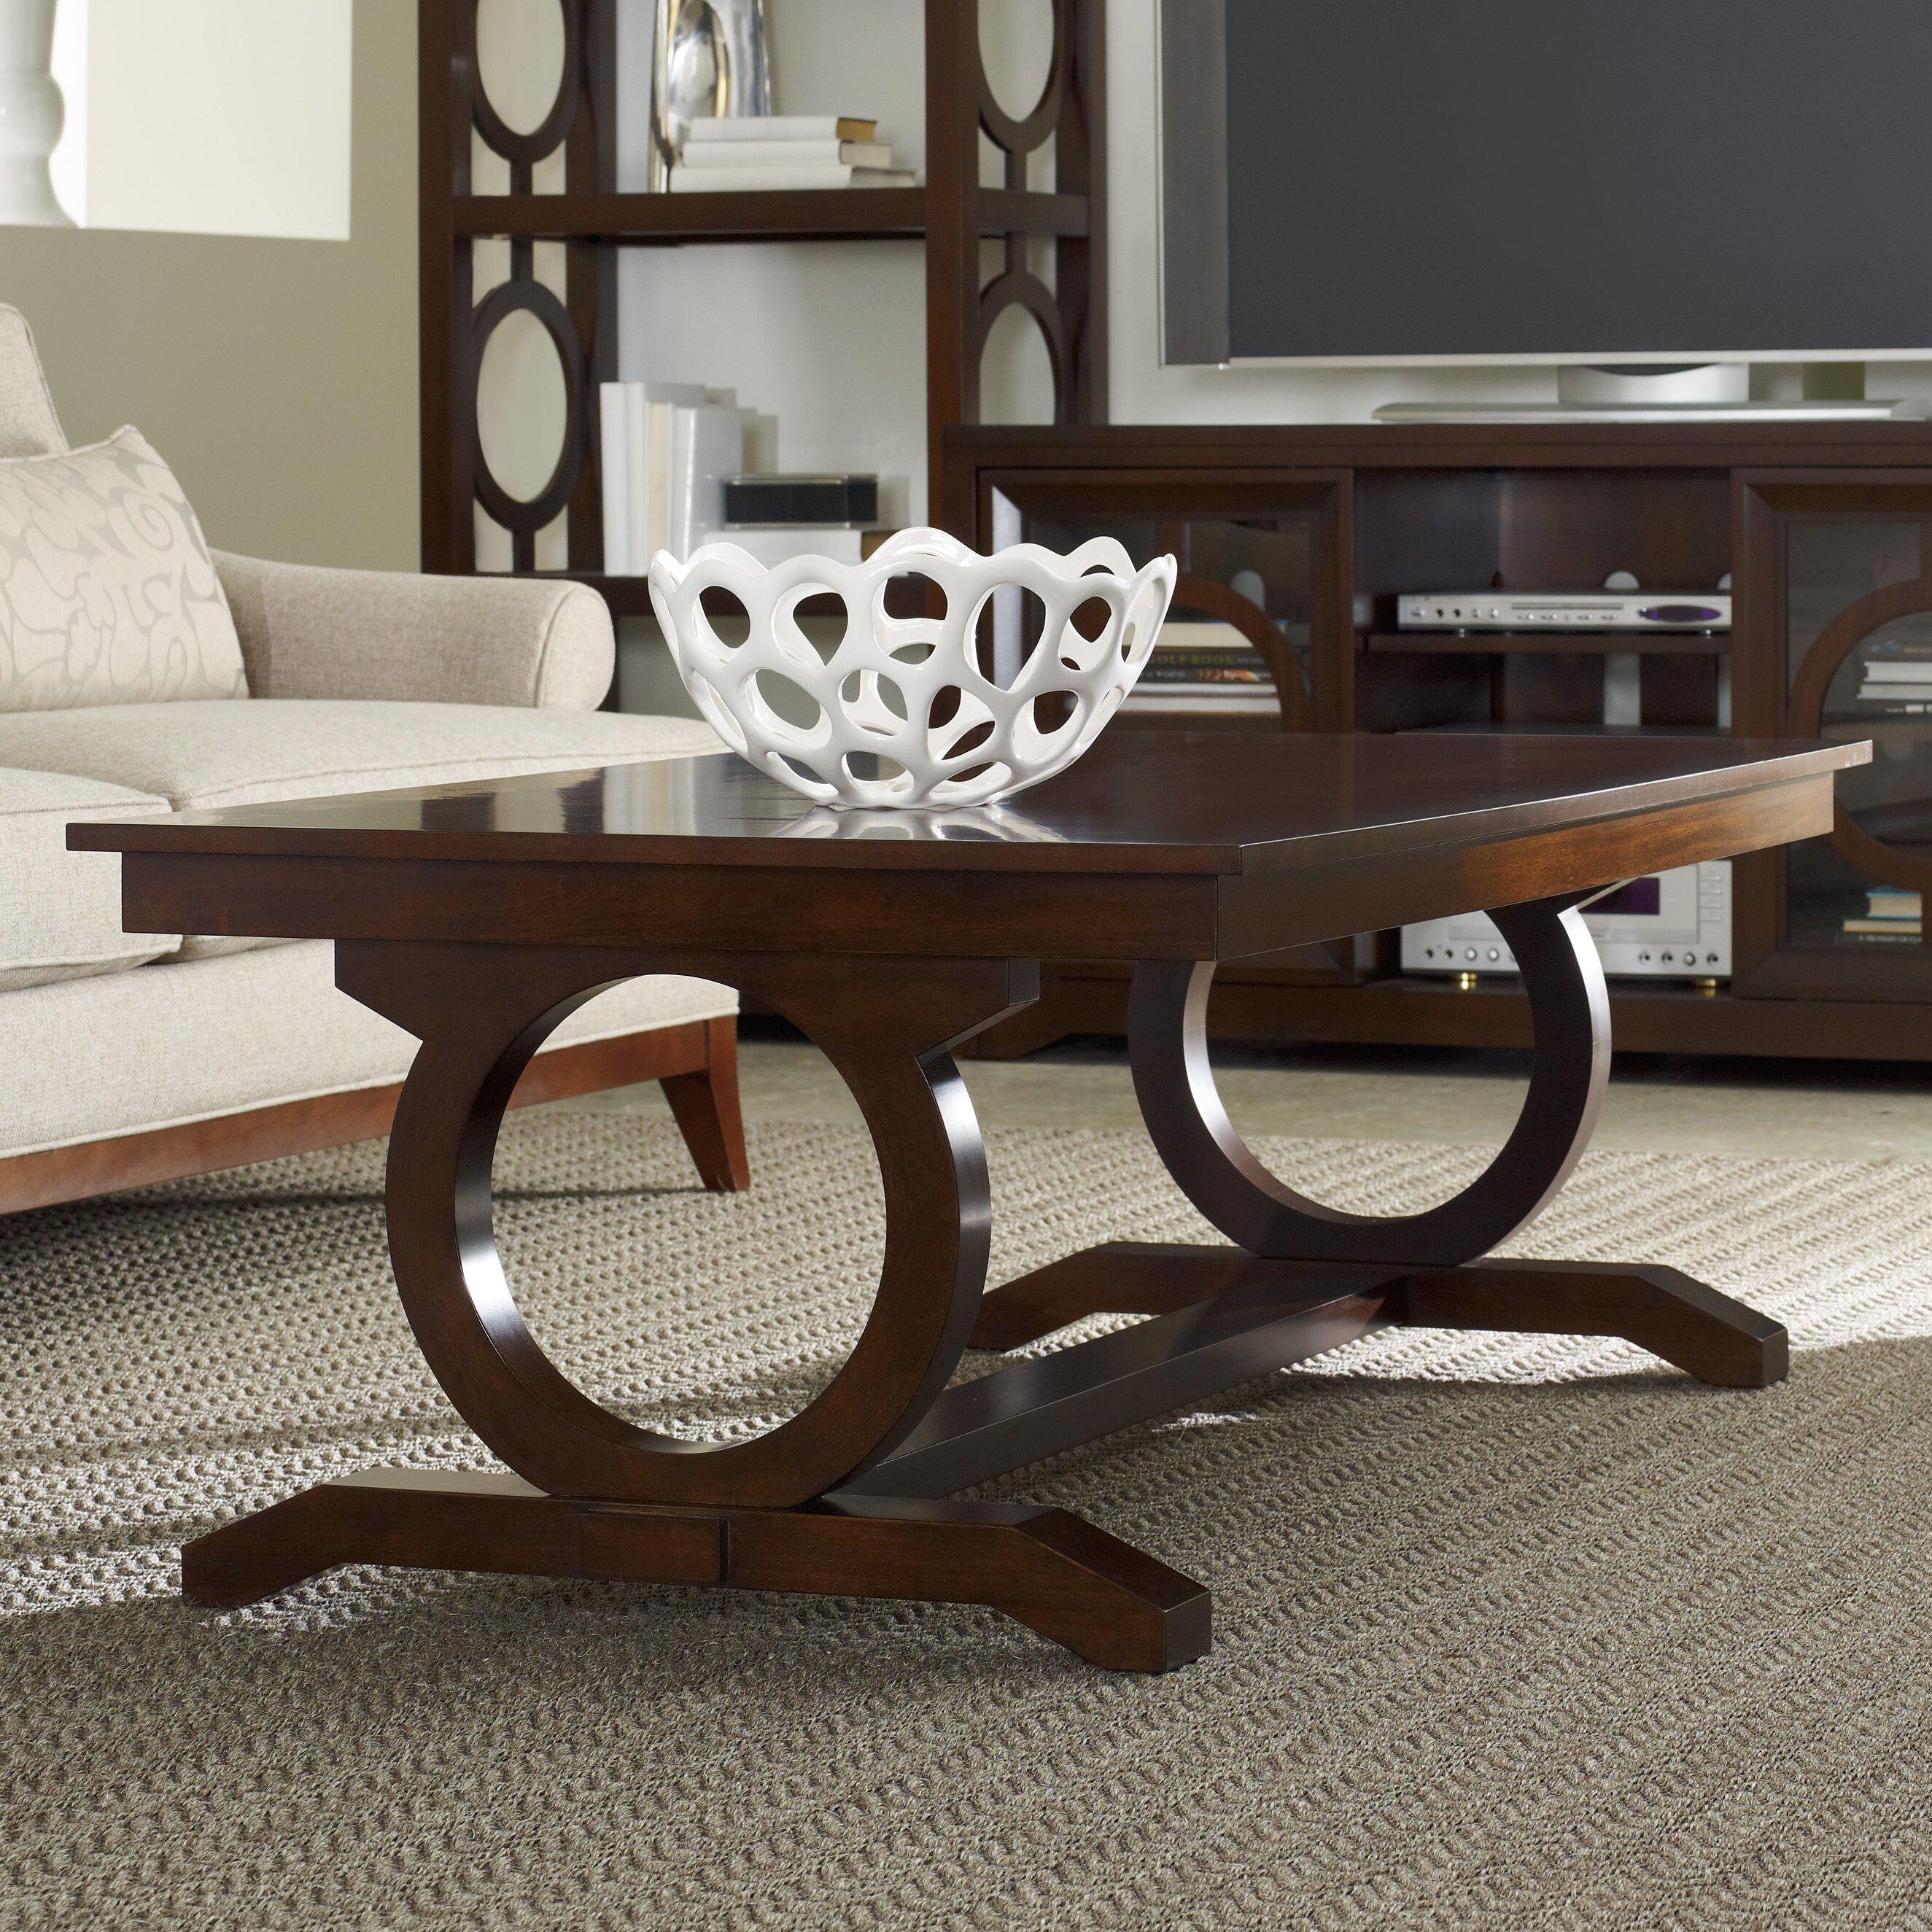 Https Www Wayfair Com Hooker Furniture Kinsey Coffee Table 5066 80110 Hkr8077 Html